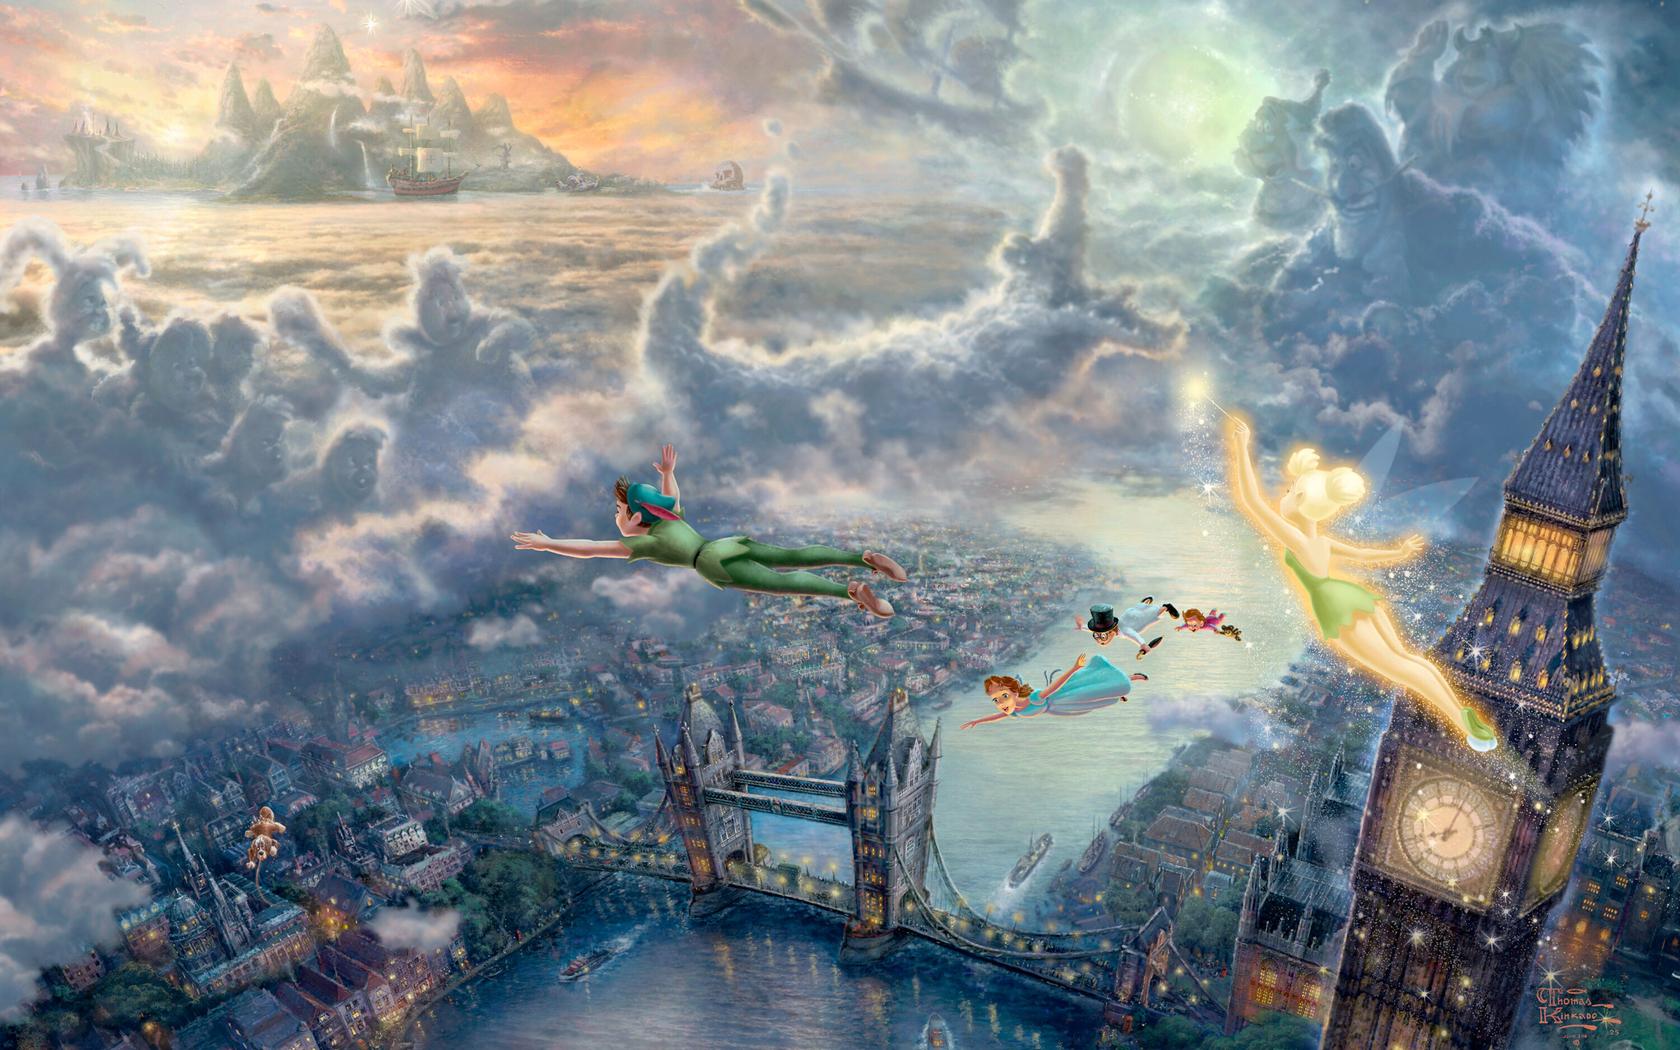 Pan Fly to Neverland Painting Art Wallpaper HD Desktop Wallpapers 1680x1050